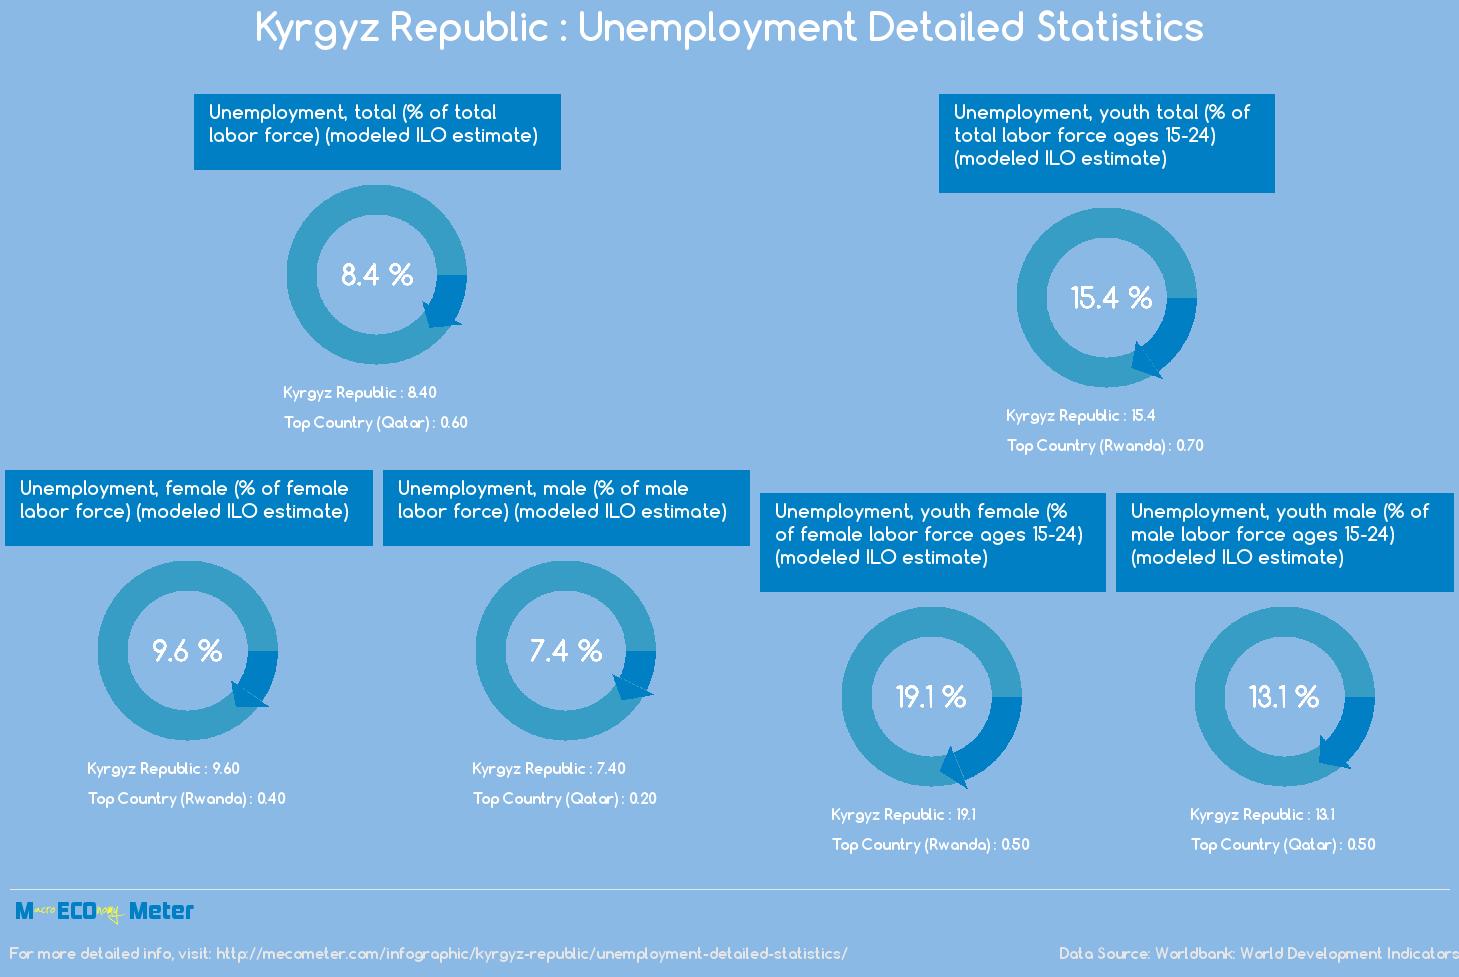 Kyrgyz Republic : Unemployment Detailed Statistics